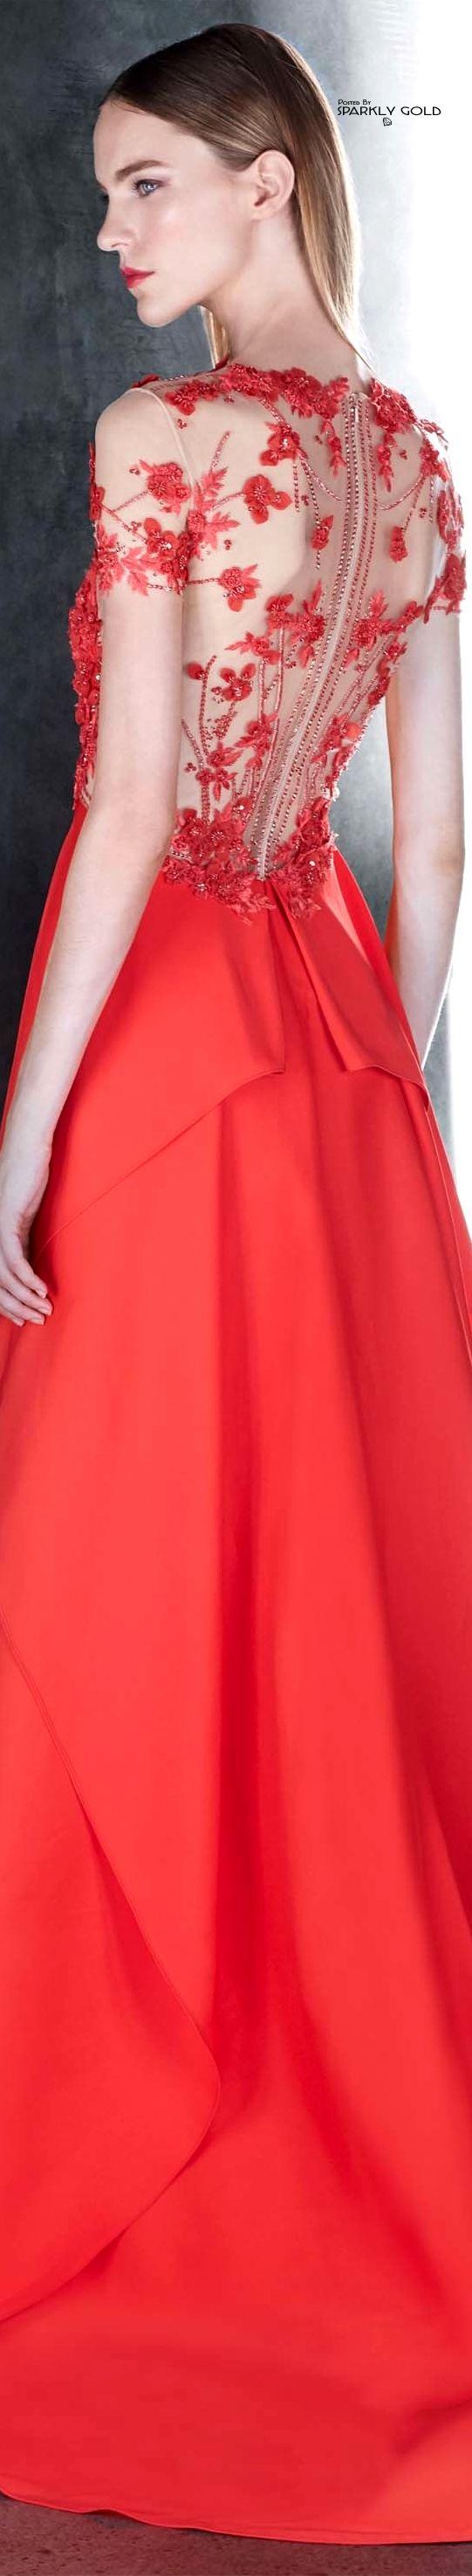 Red ball gown wedding dress  Pamella Roland Resort   THE GOWN BOUTIQUE  Pinterest  Resorts